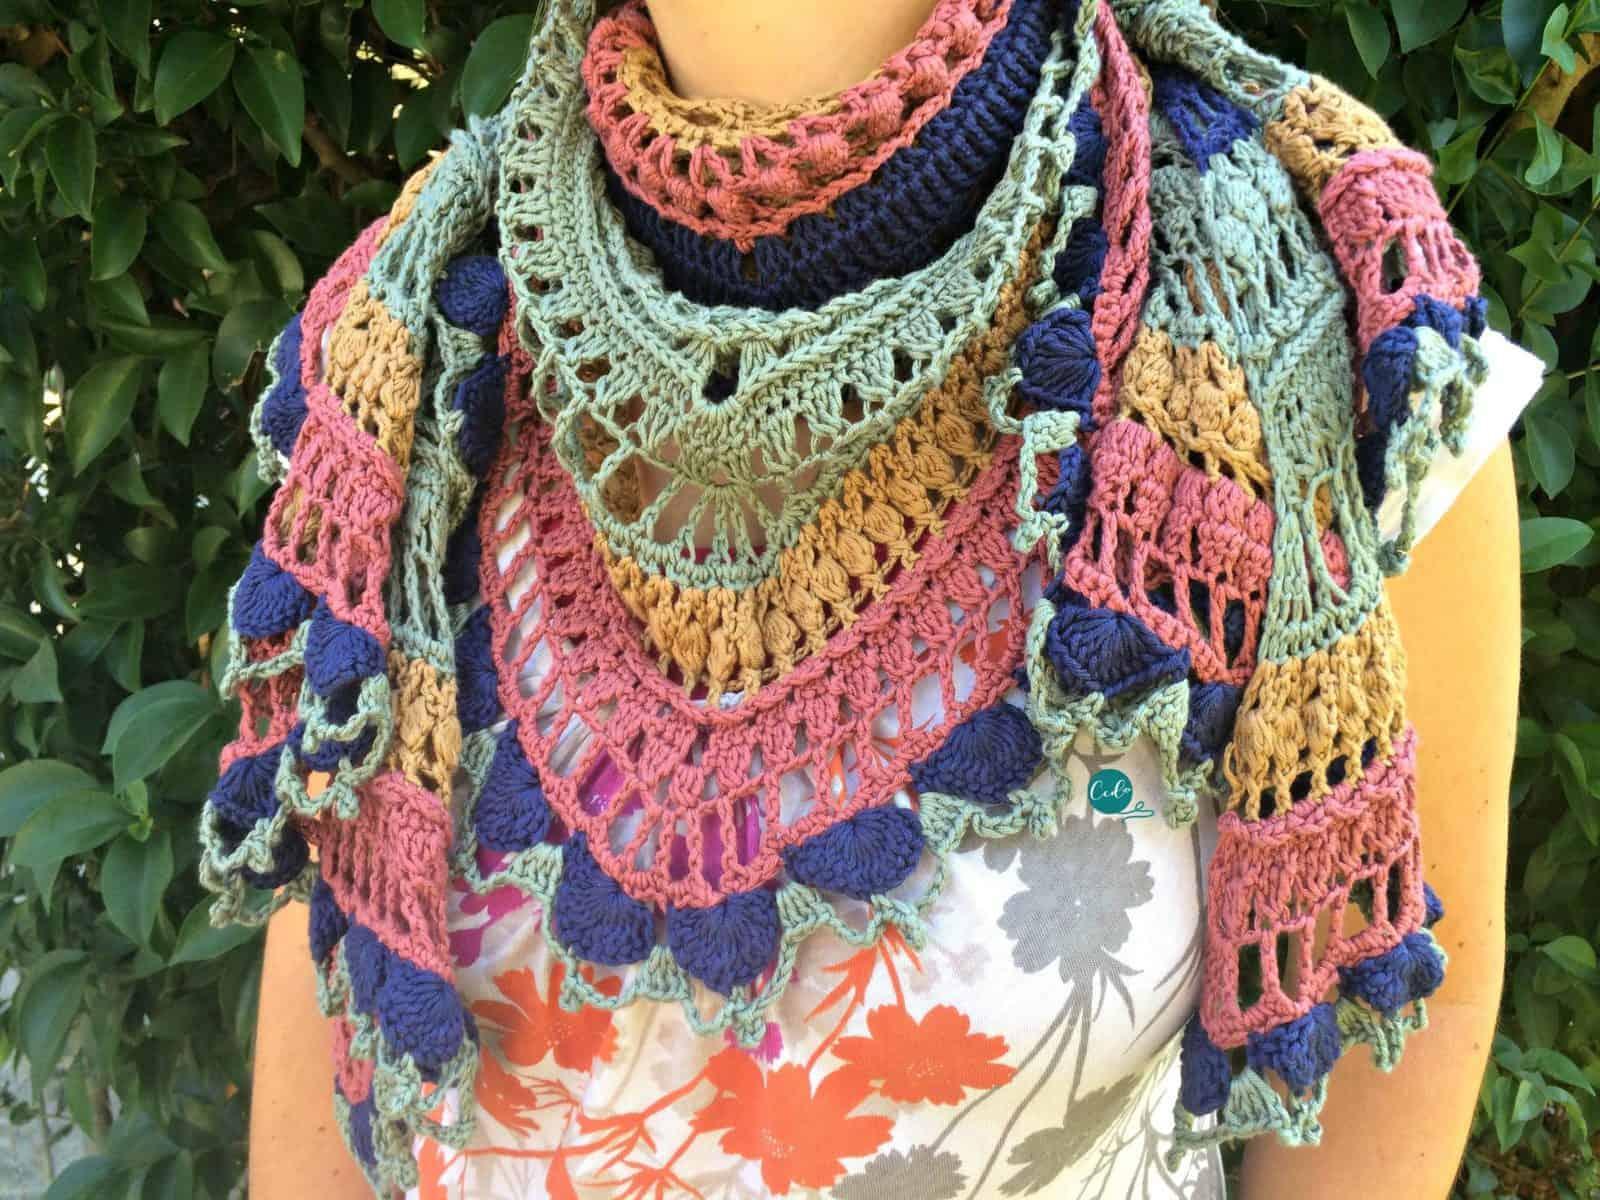 Ottobre Shawlette Free Crochet Pattern and Tutorial